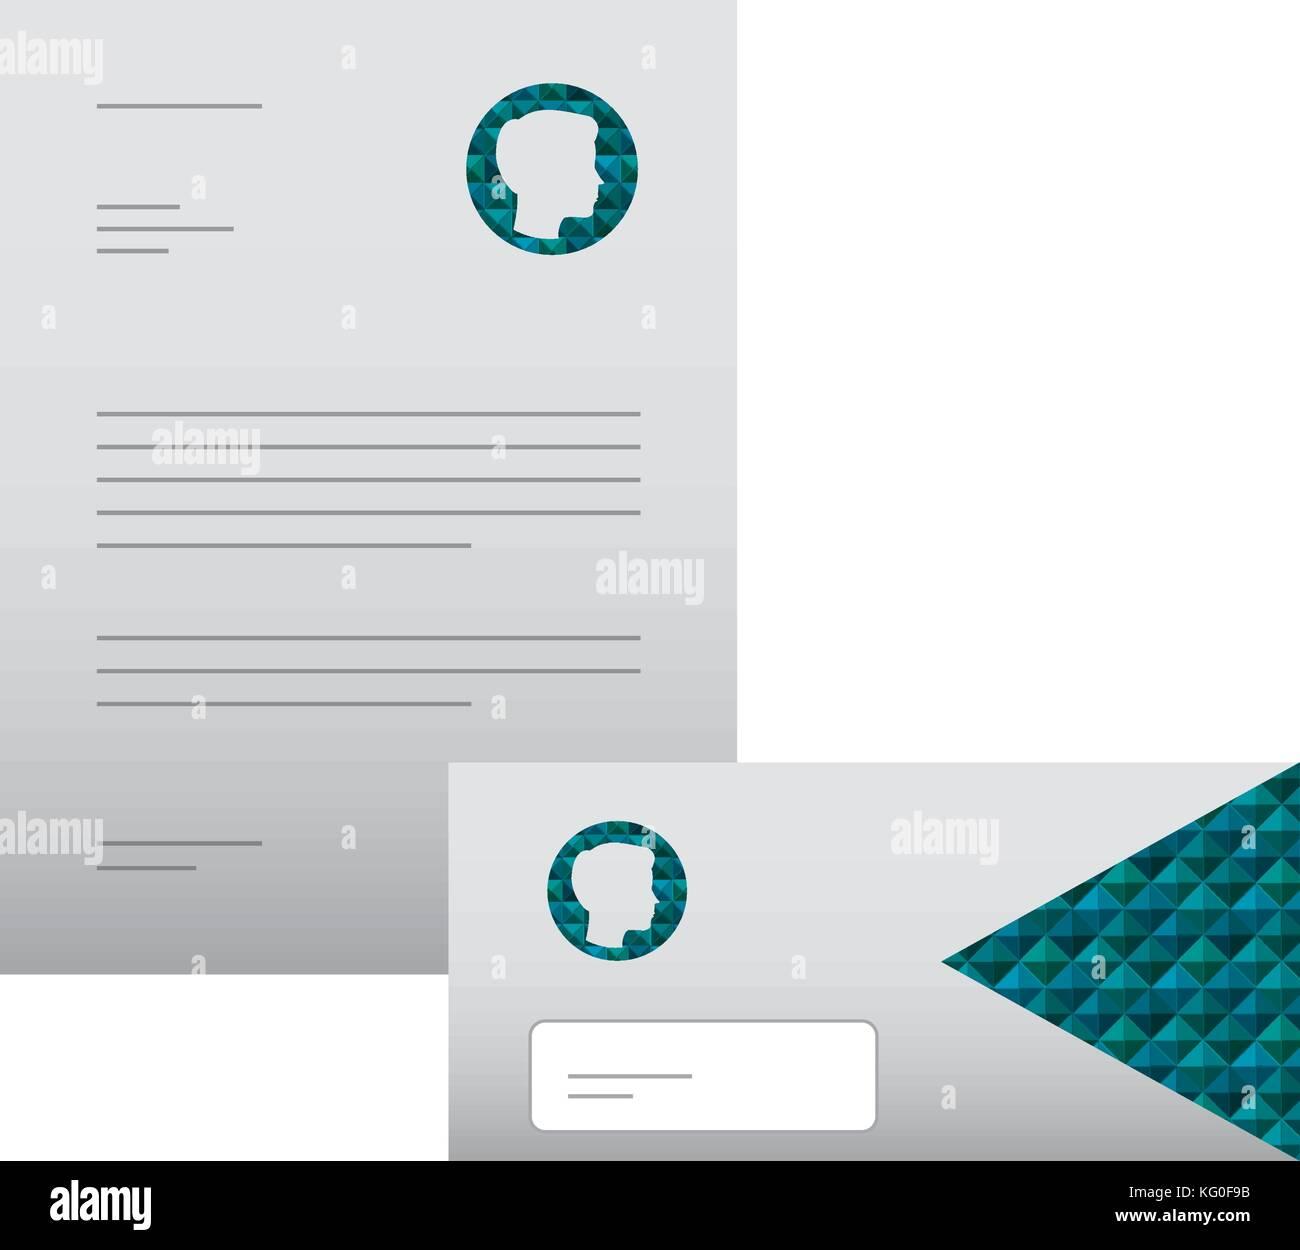 Business letterhead envelope stationary branding template for stock business letterhead envelope stationary branding template for presentation spiritdancerdesigns Images